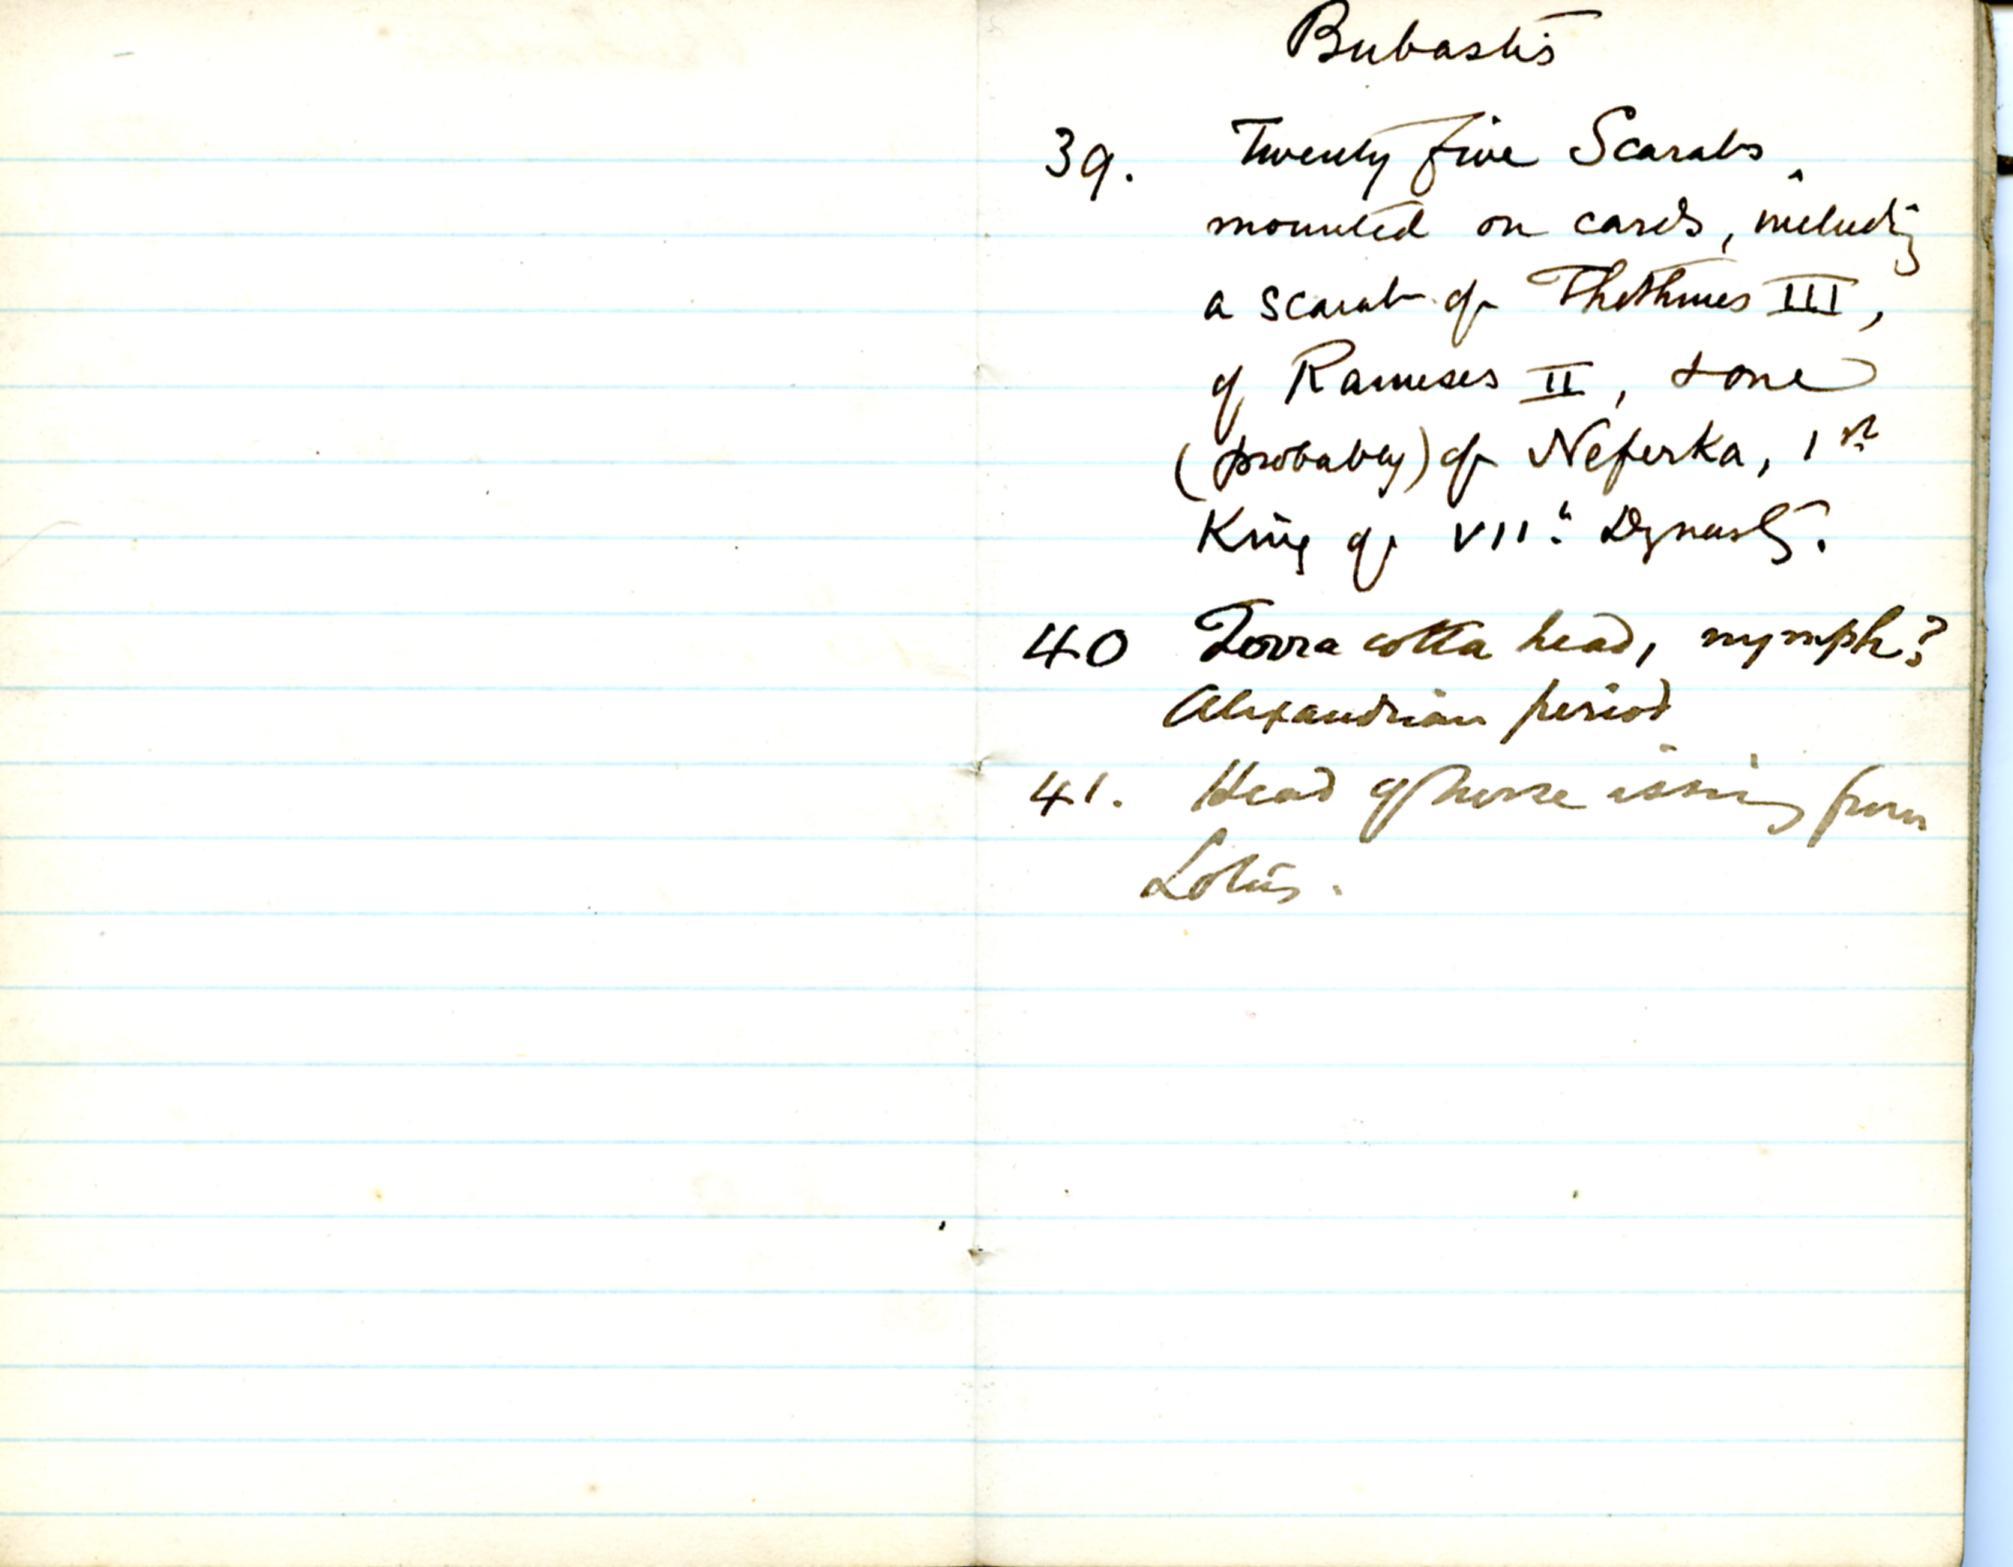 1884-85 Naukratis, Tanis, Bubastis, Tell el-Yahudiya, Nebesheh, Tell Dafana, Tell Sueilin, Tell el-Maskuta DIST.10.01m